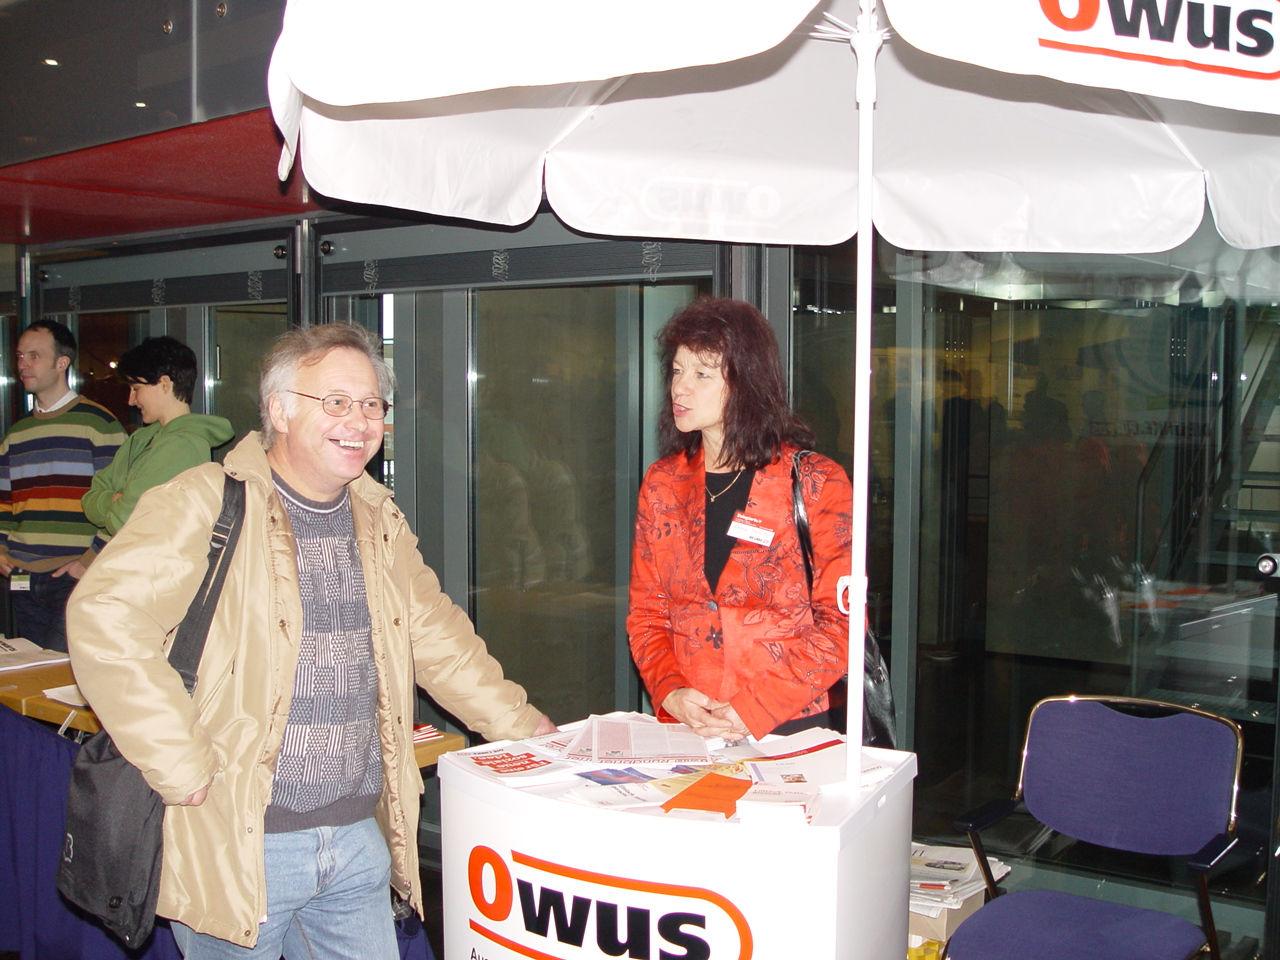 OWUS Informationsstand 2005